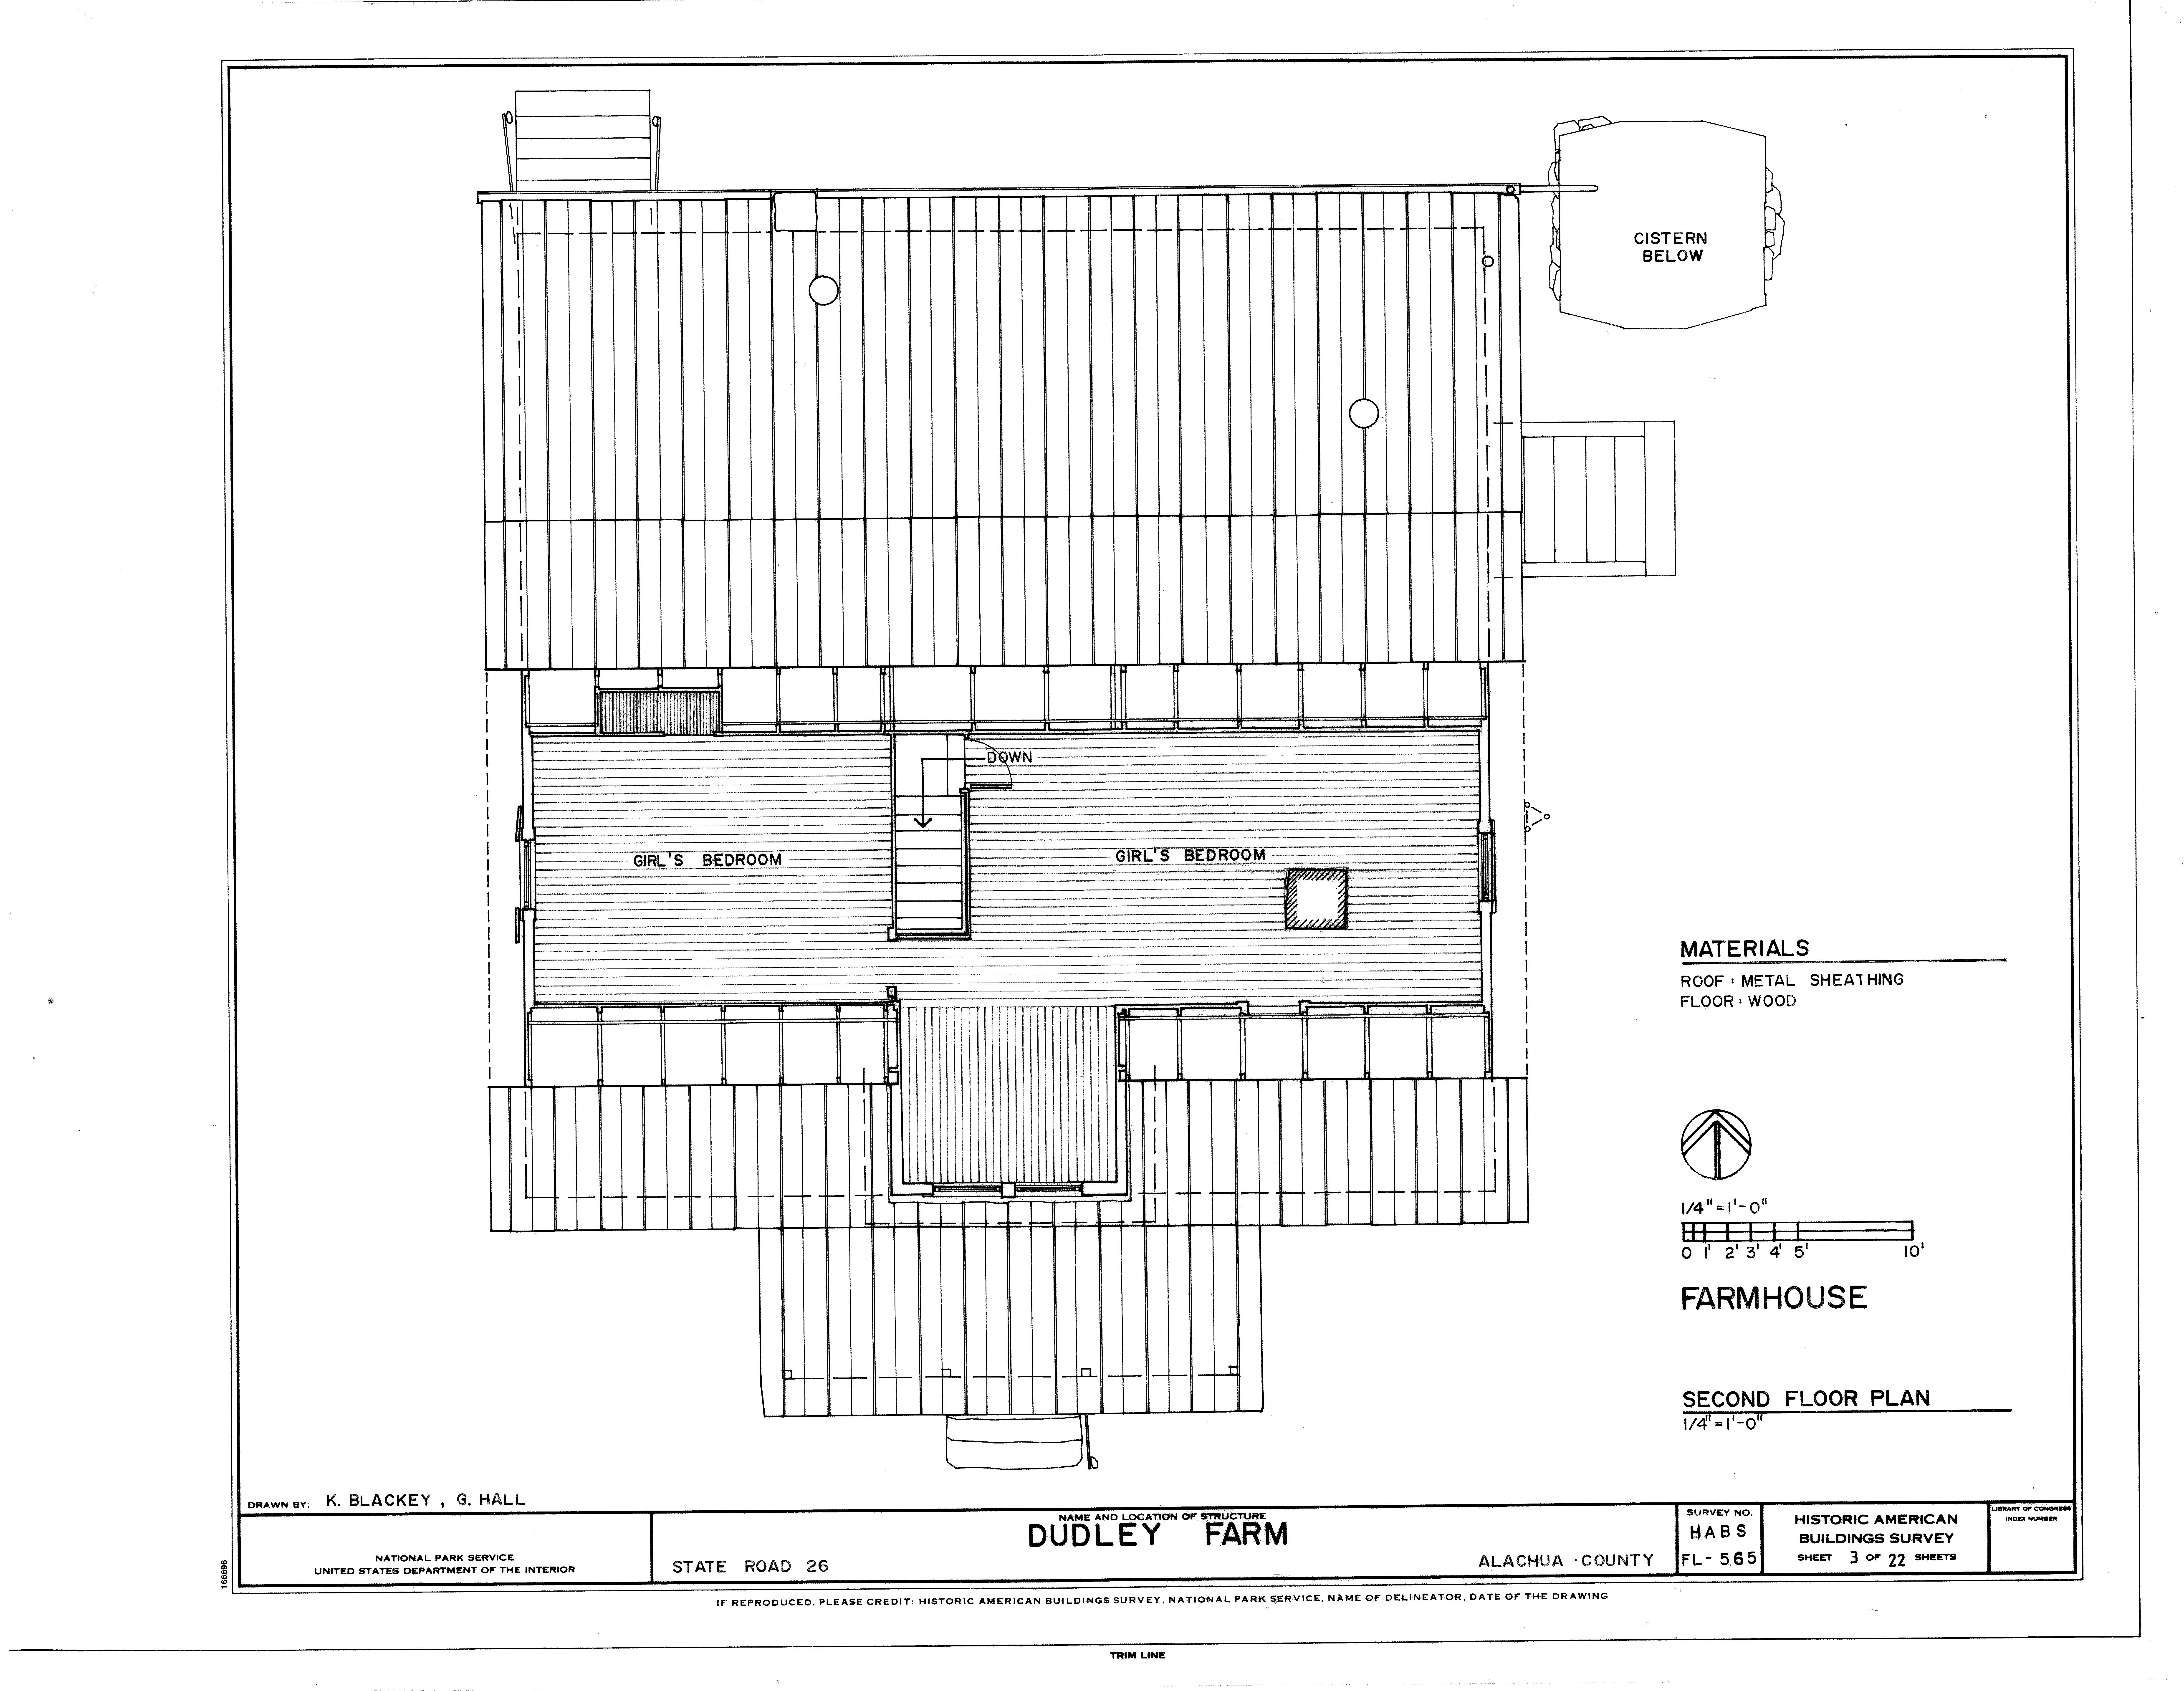 file farmhouse second floor plan dudley farm farmhouse and file farmhouse second floor plan dudley farm farmhouse and outbuildings 18730